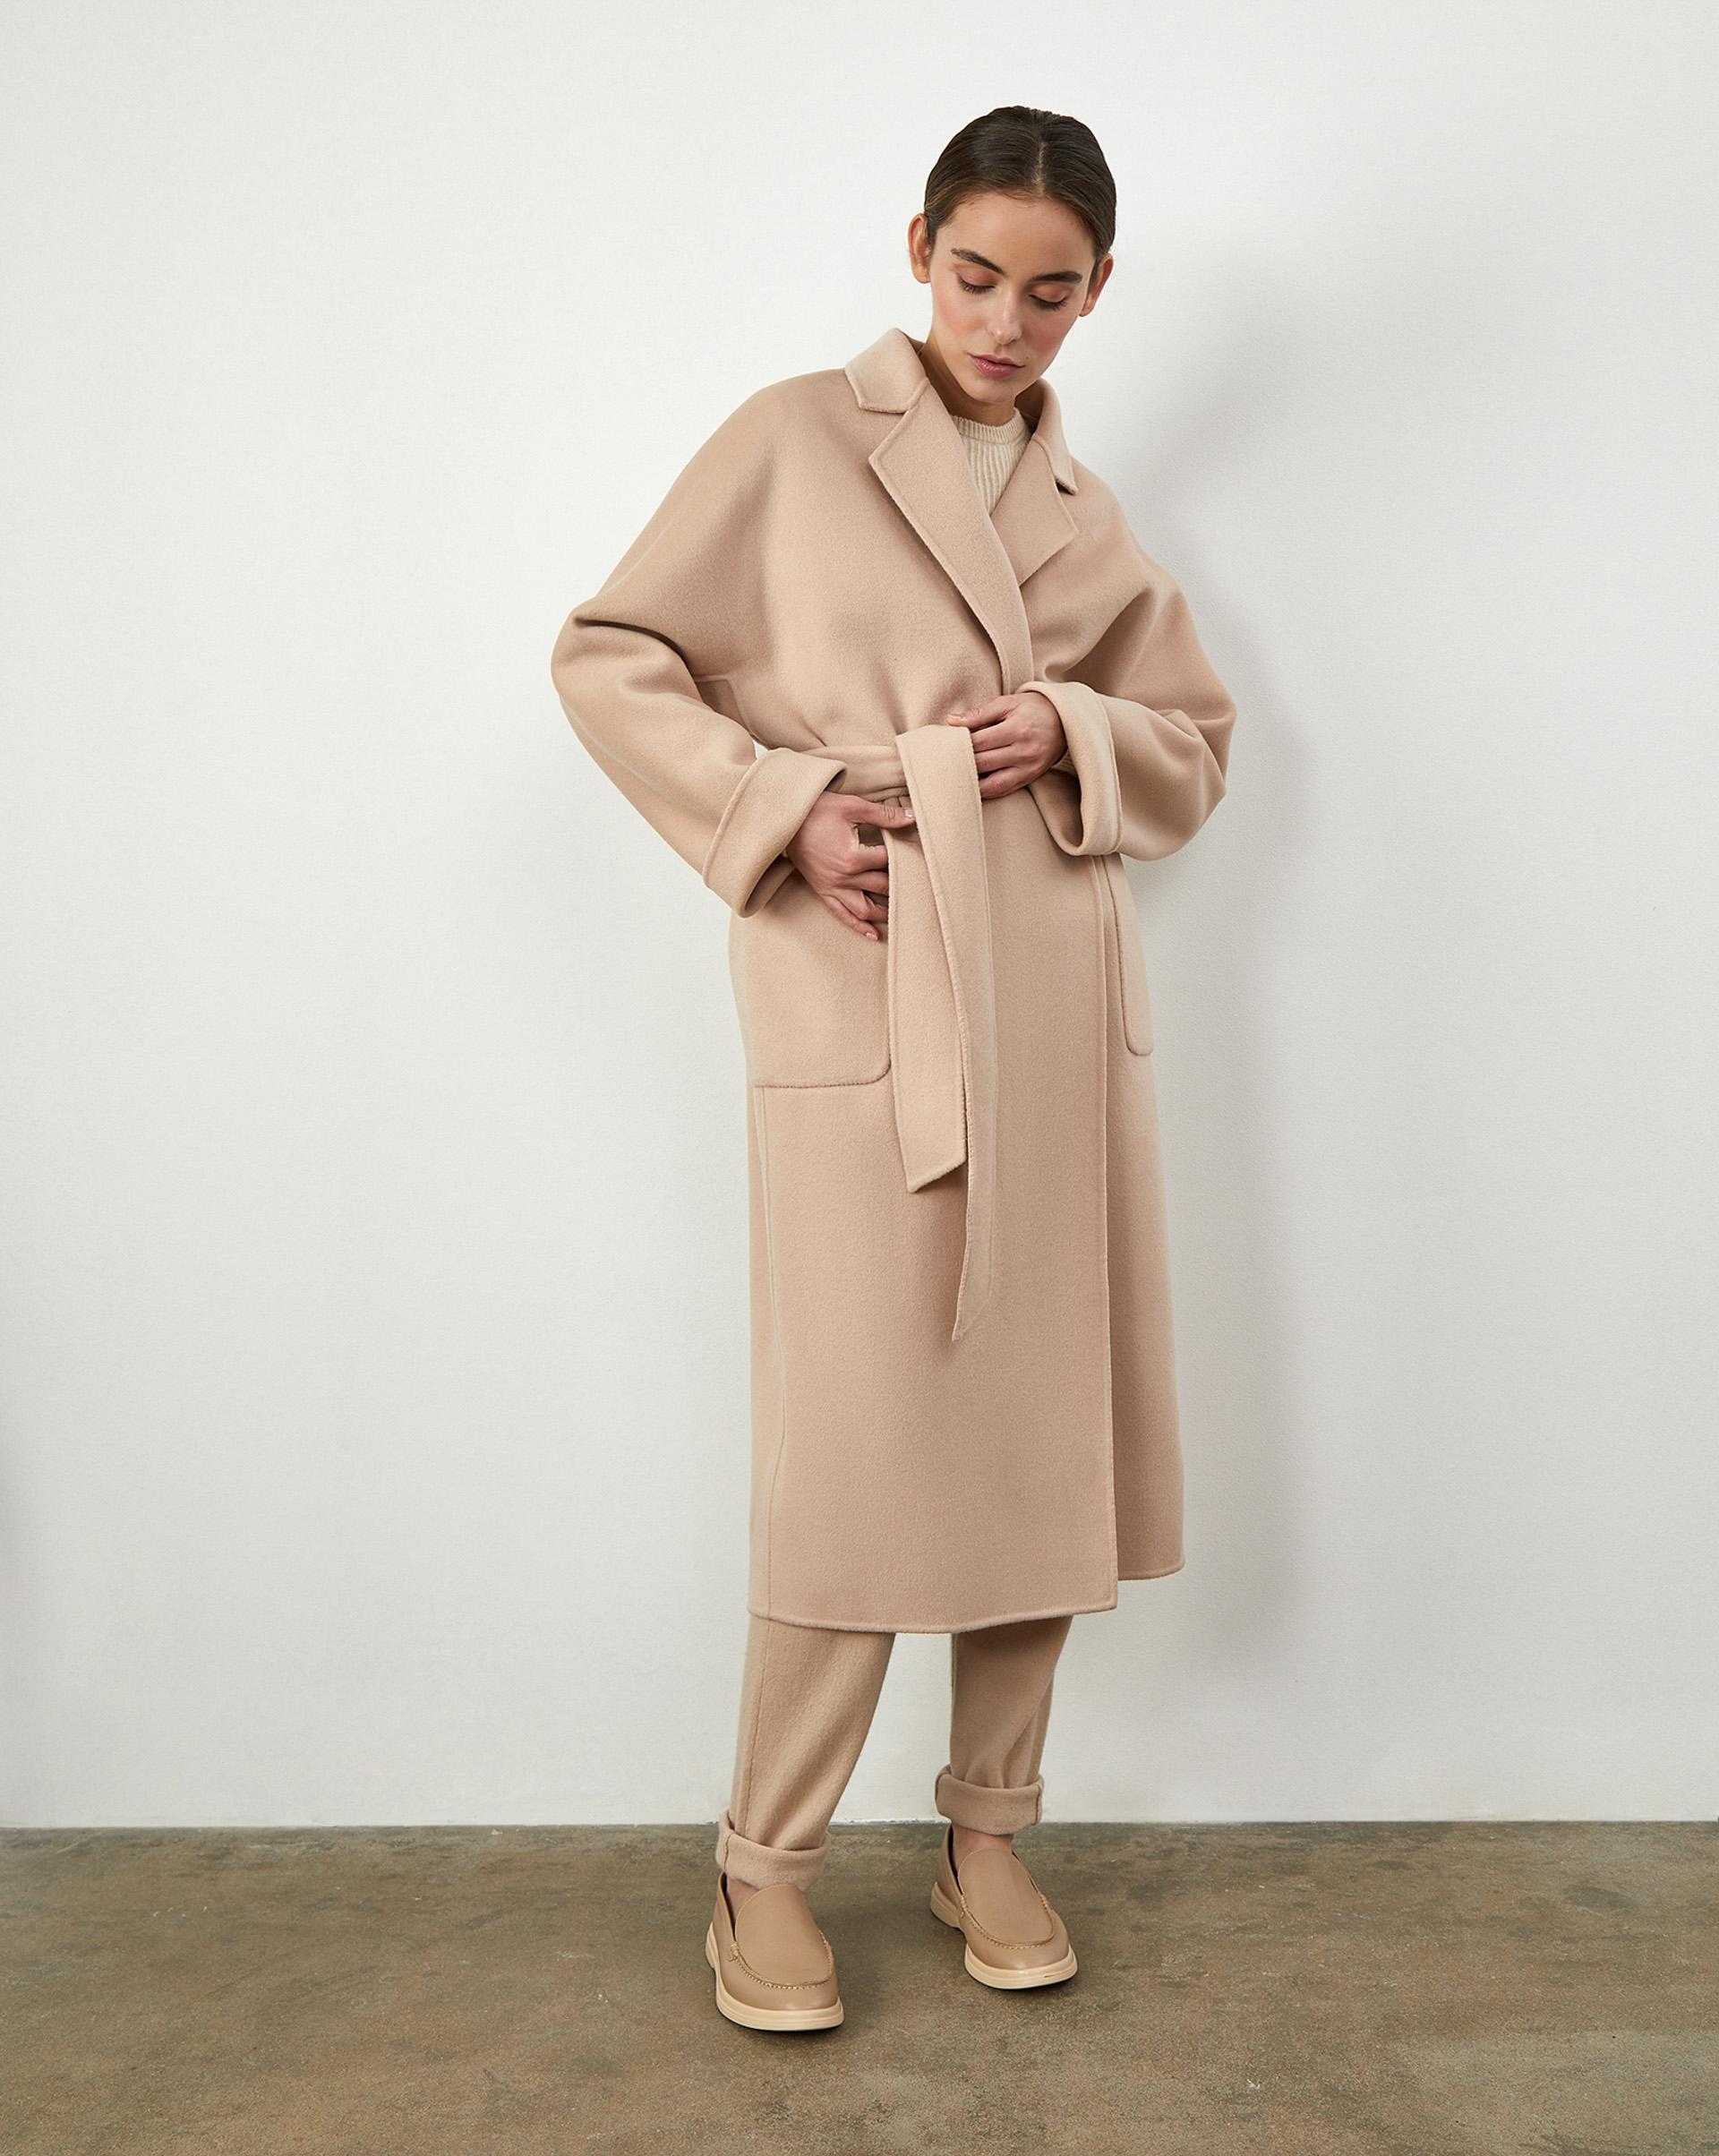 Пальто-халат One size фото